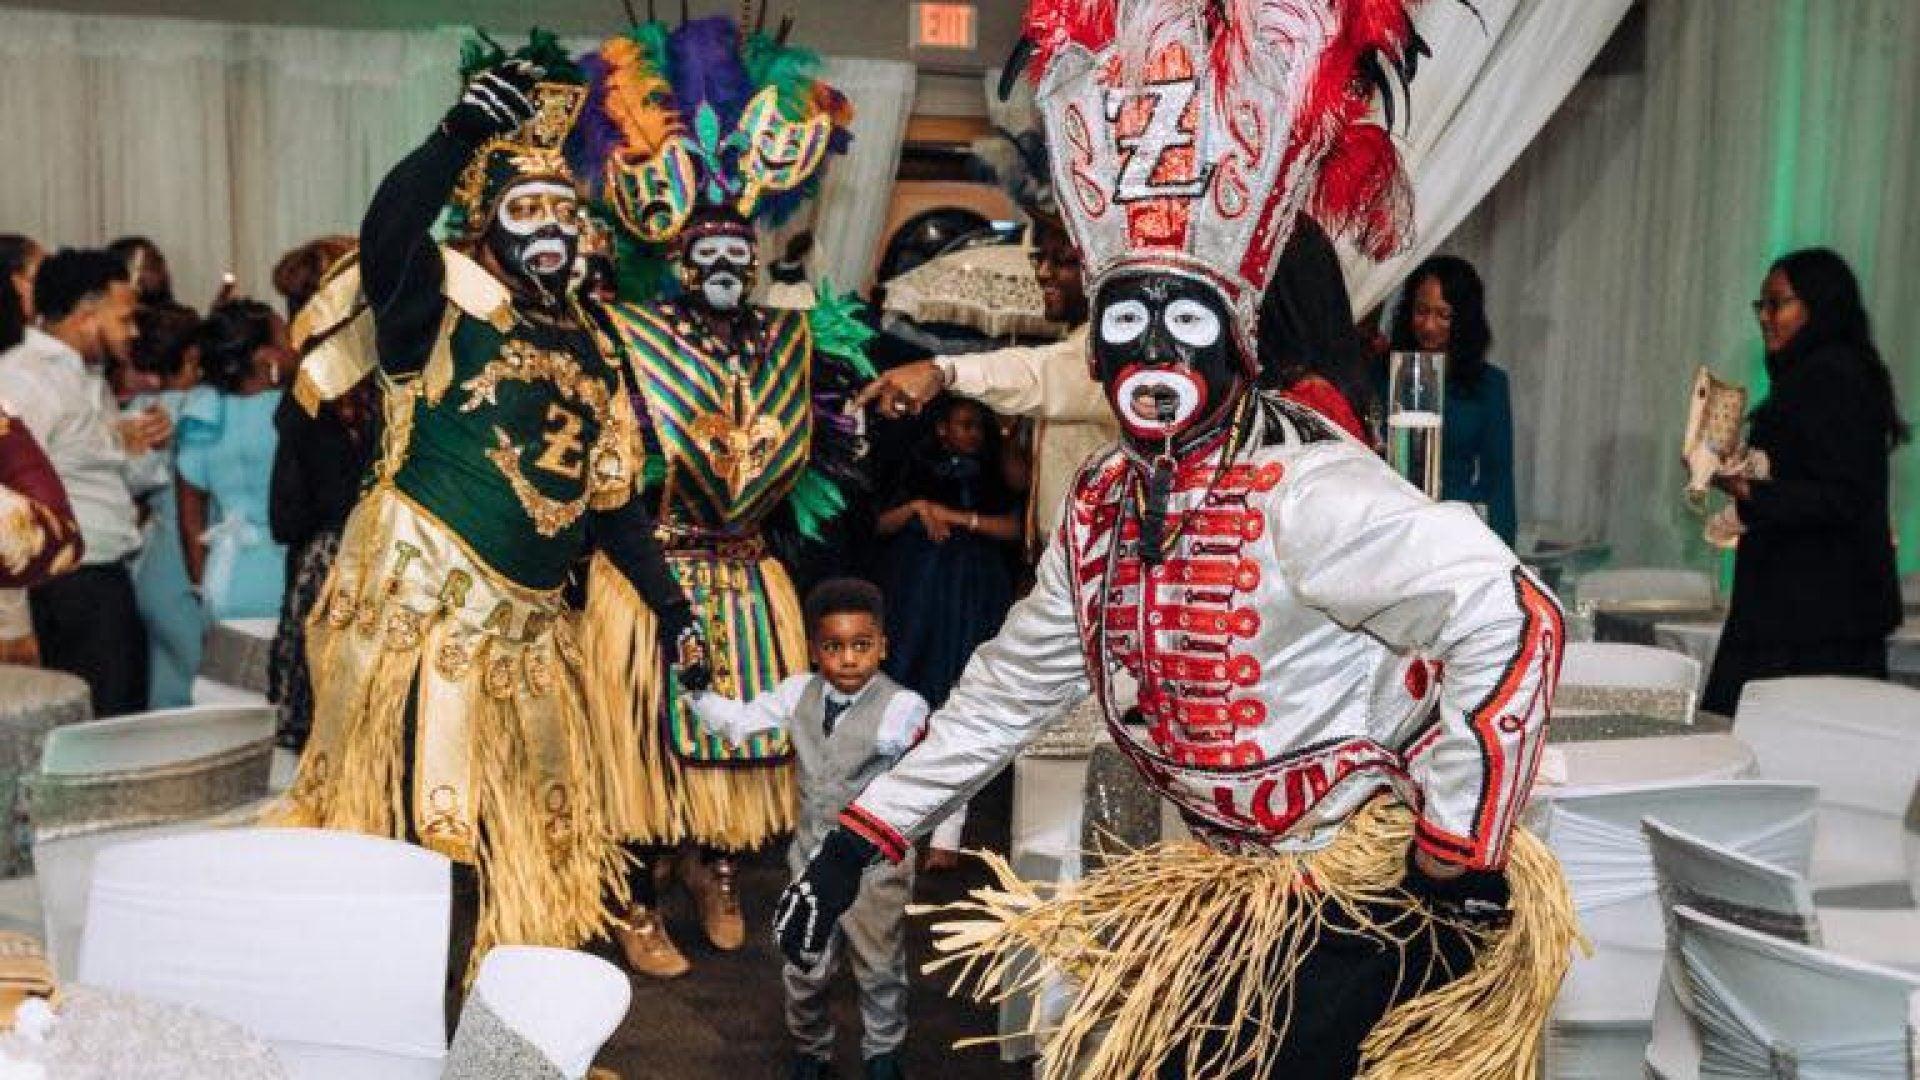 Blackface Protestors Target Prominent Mardi Gras Group